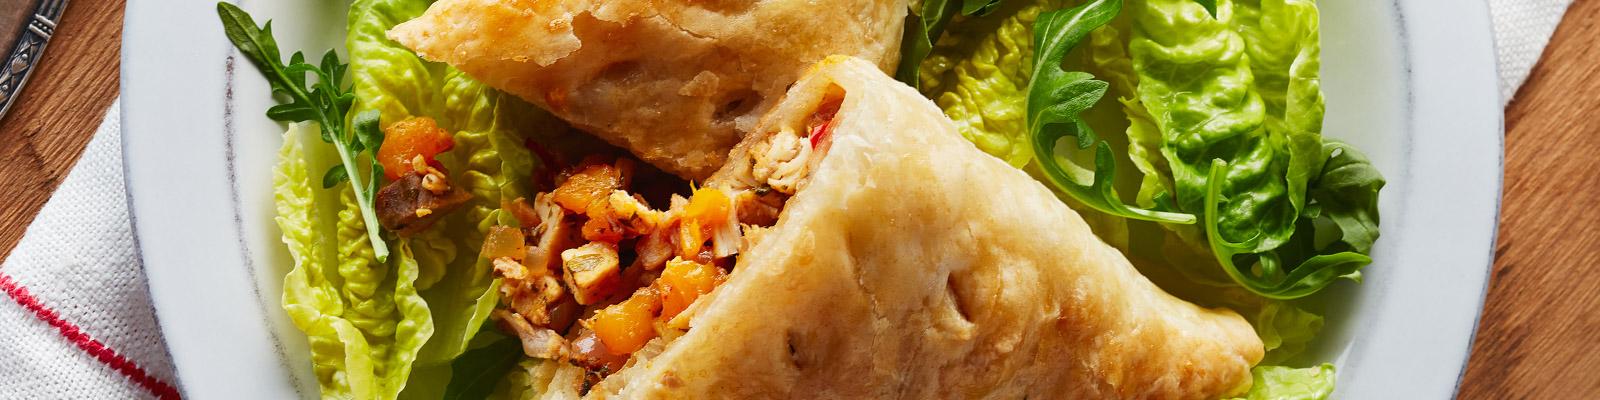 1600x400_Recipe_Smoked_Chicken_Salsa_Empanadas.jpg